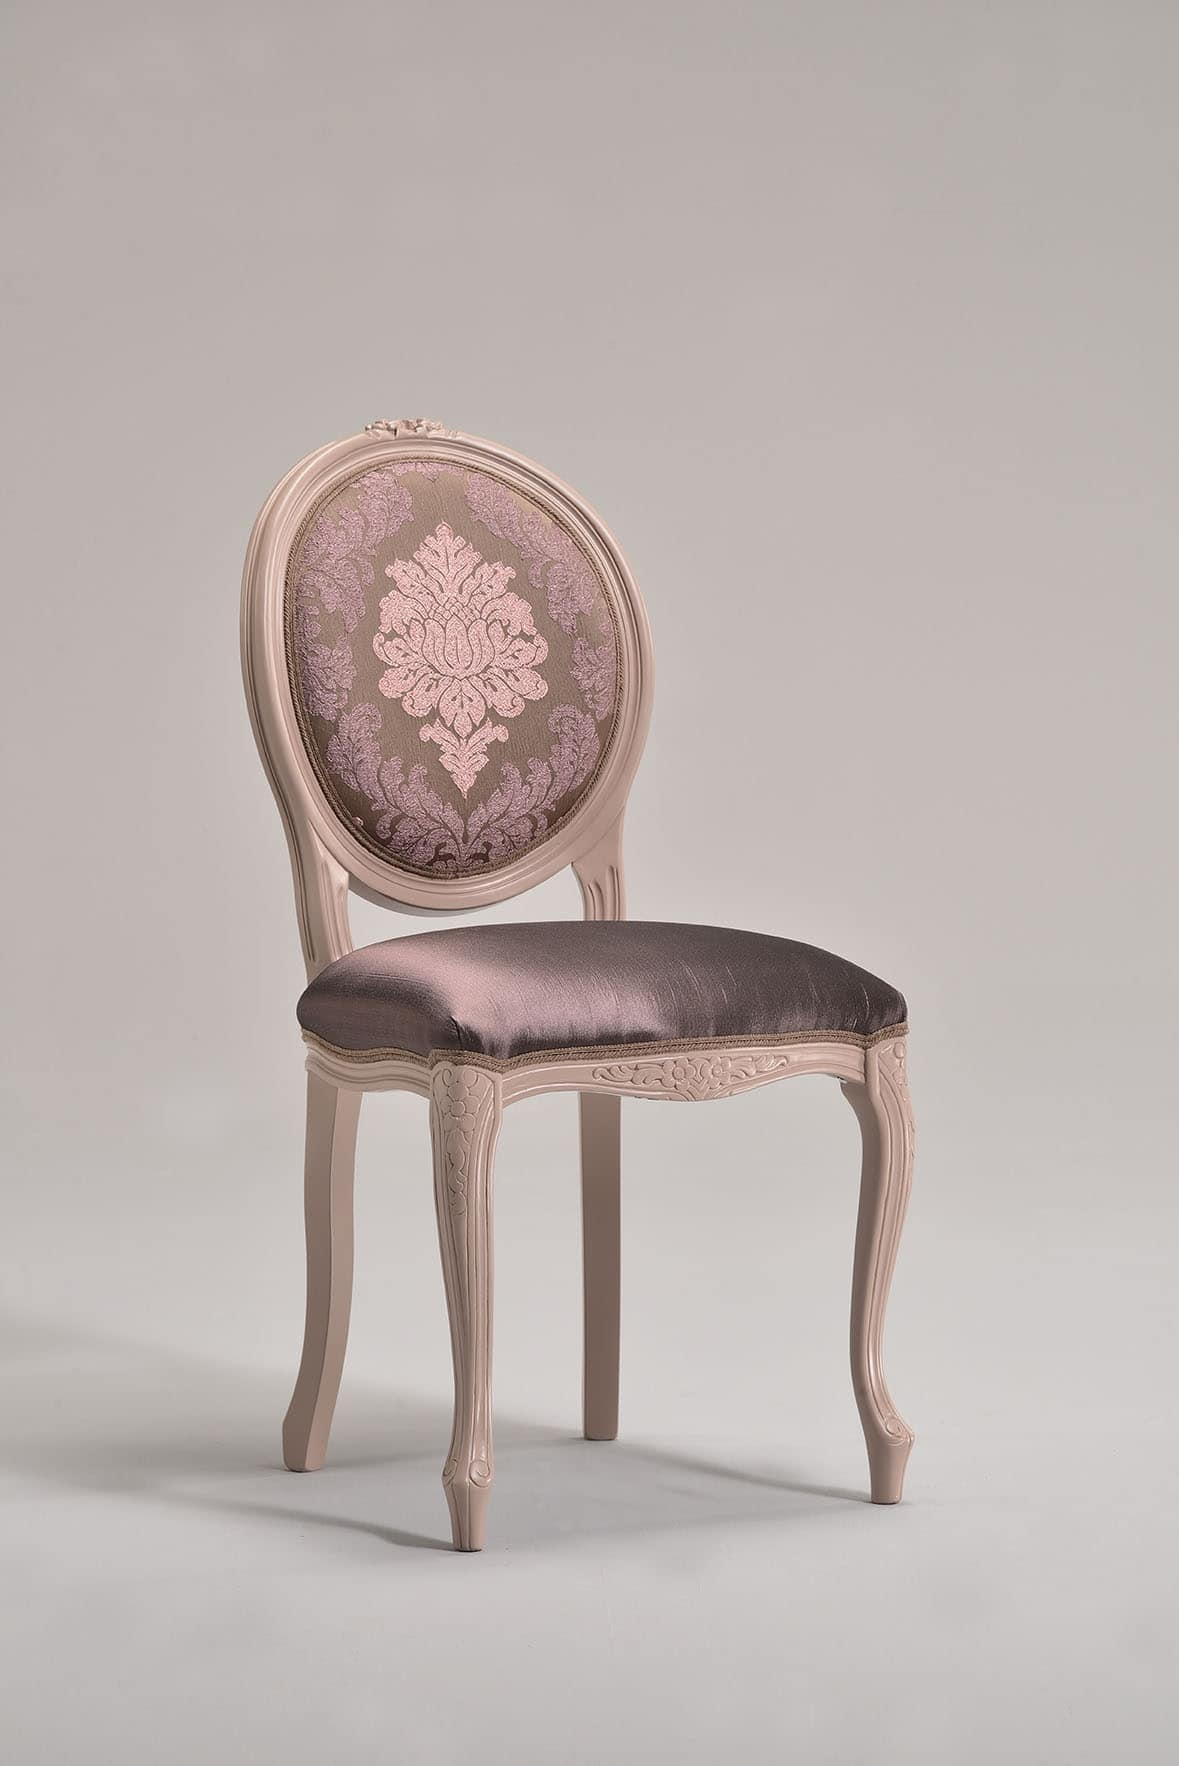 holzstuhl anpassbare stoff f r alte kaffee idfdesign. Black Bedroom Furniture Sets. Home Design Ideas